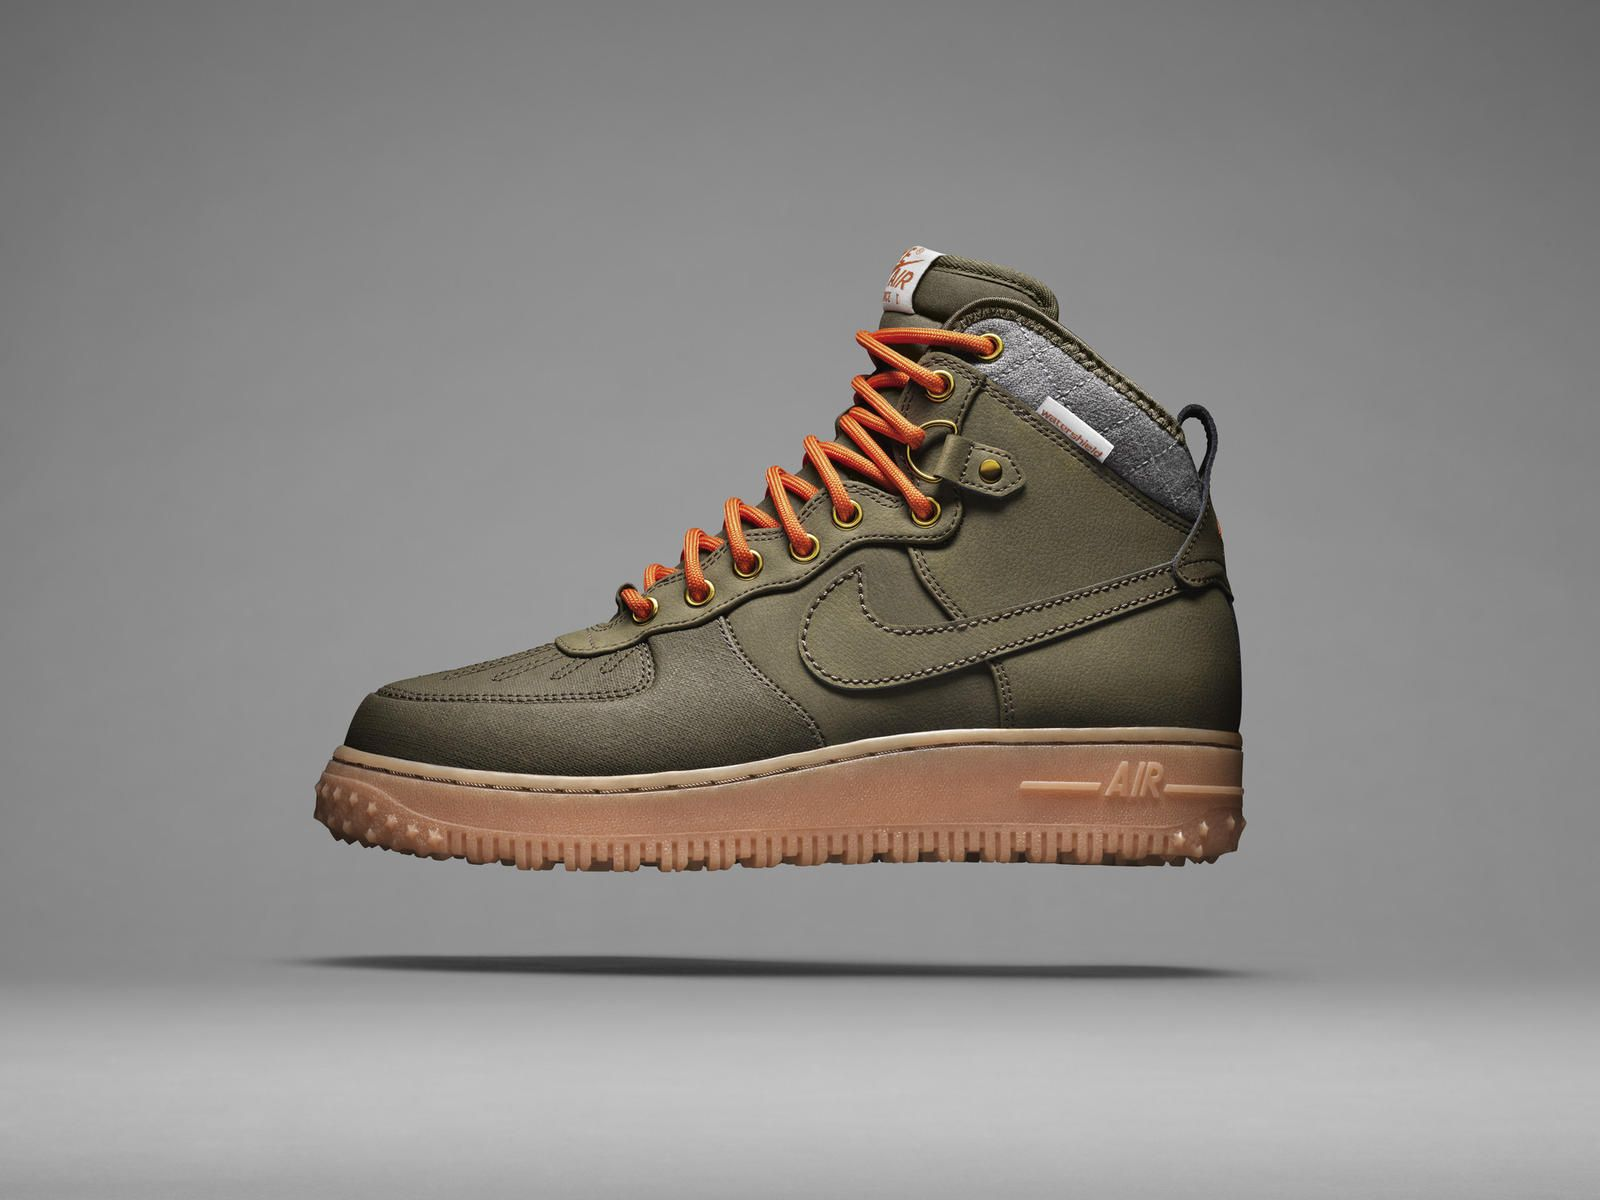 nike air max 1 sneaker boot burgundy background